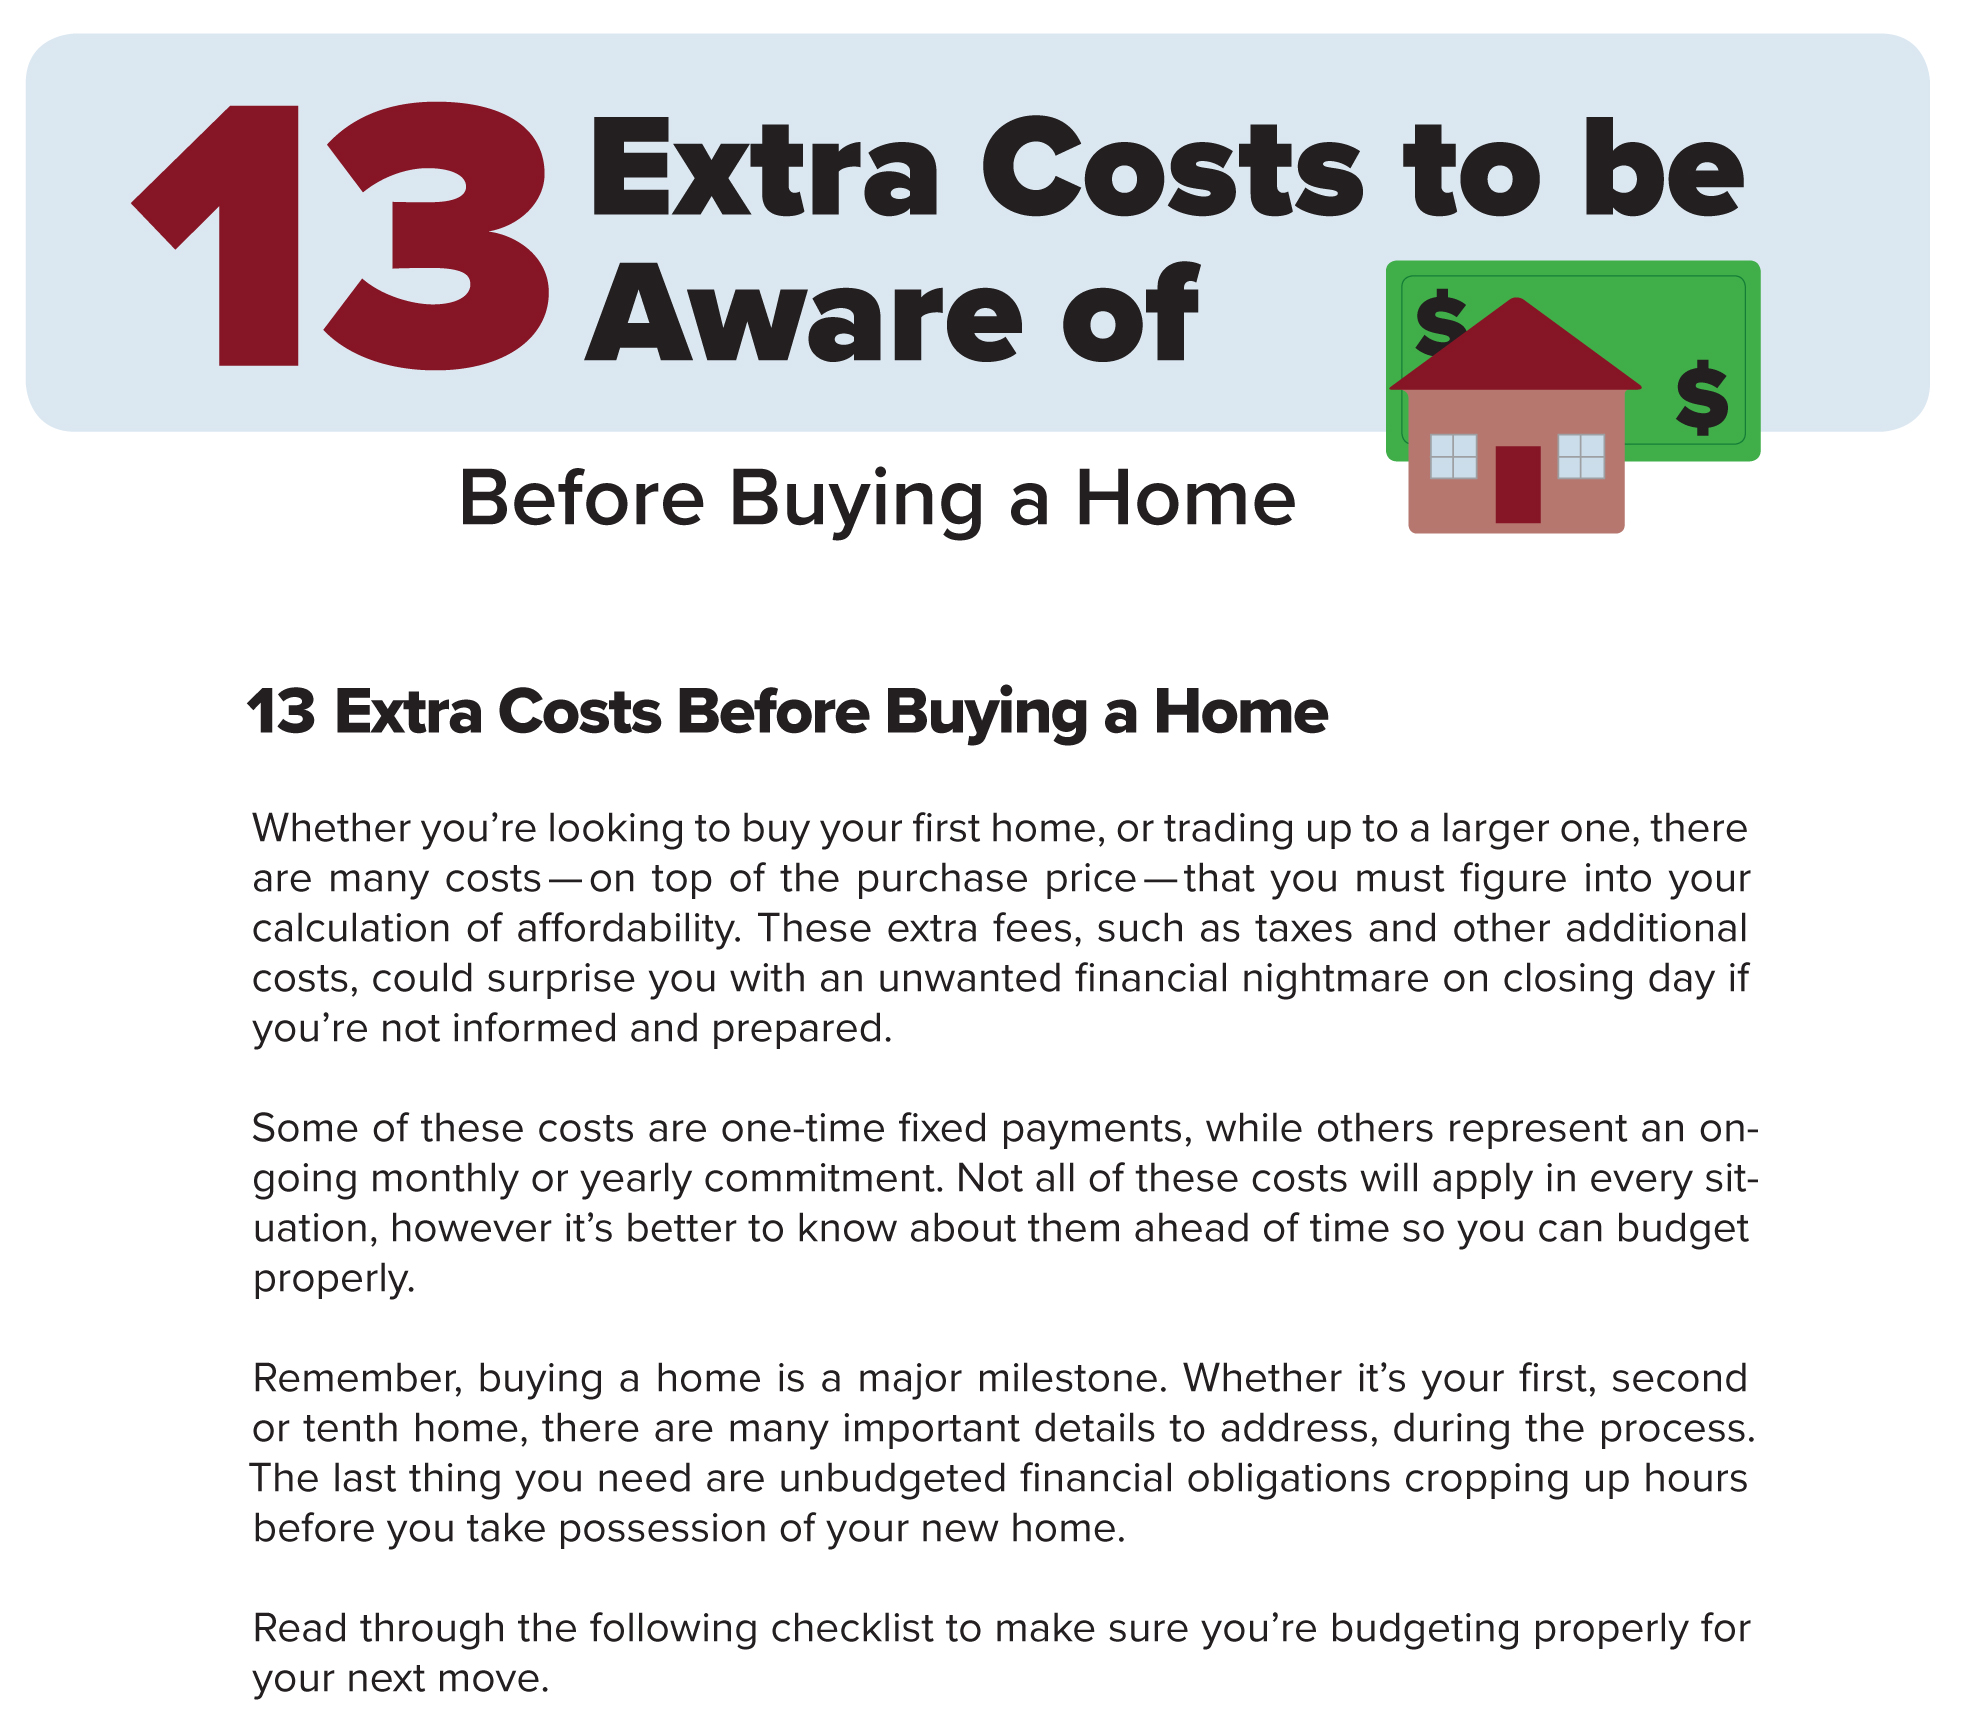 13 extra costs-1.jpg